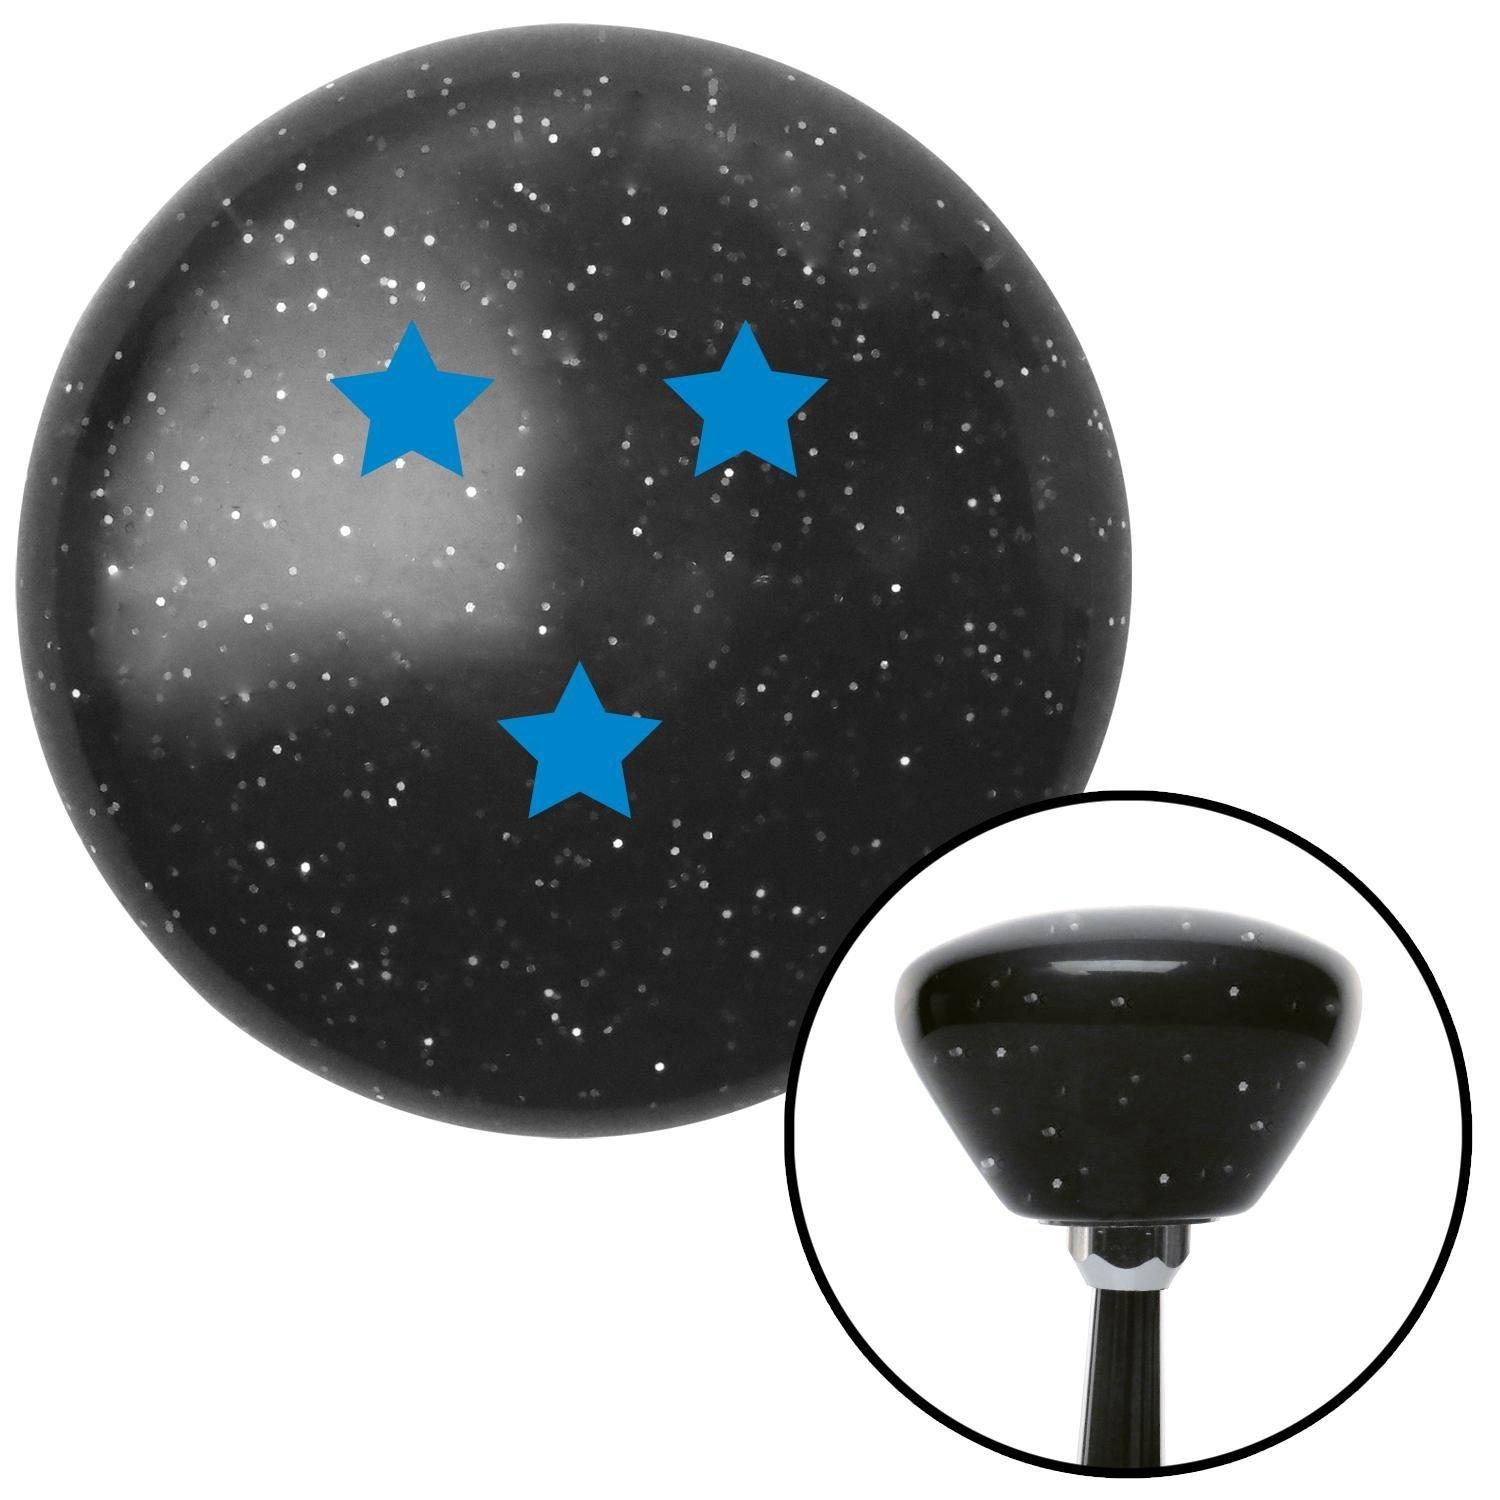 American Shifter 175938 Black Retro Metal Flake Shift Knob with M16 x 1.5 Insert Blue Dragon Ball Z - 3 Star